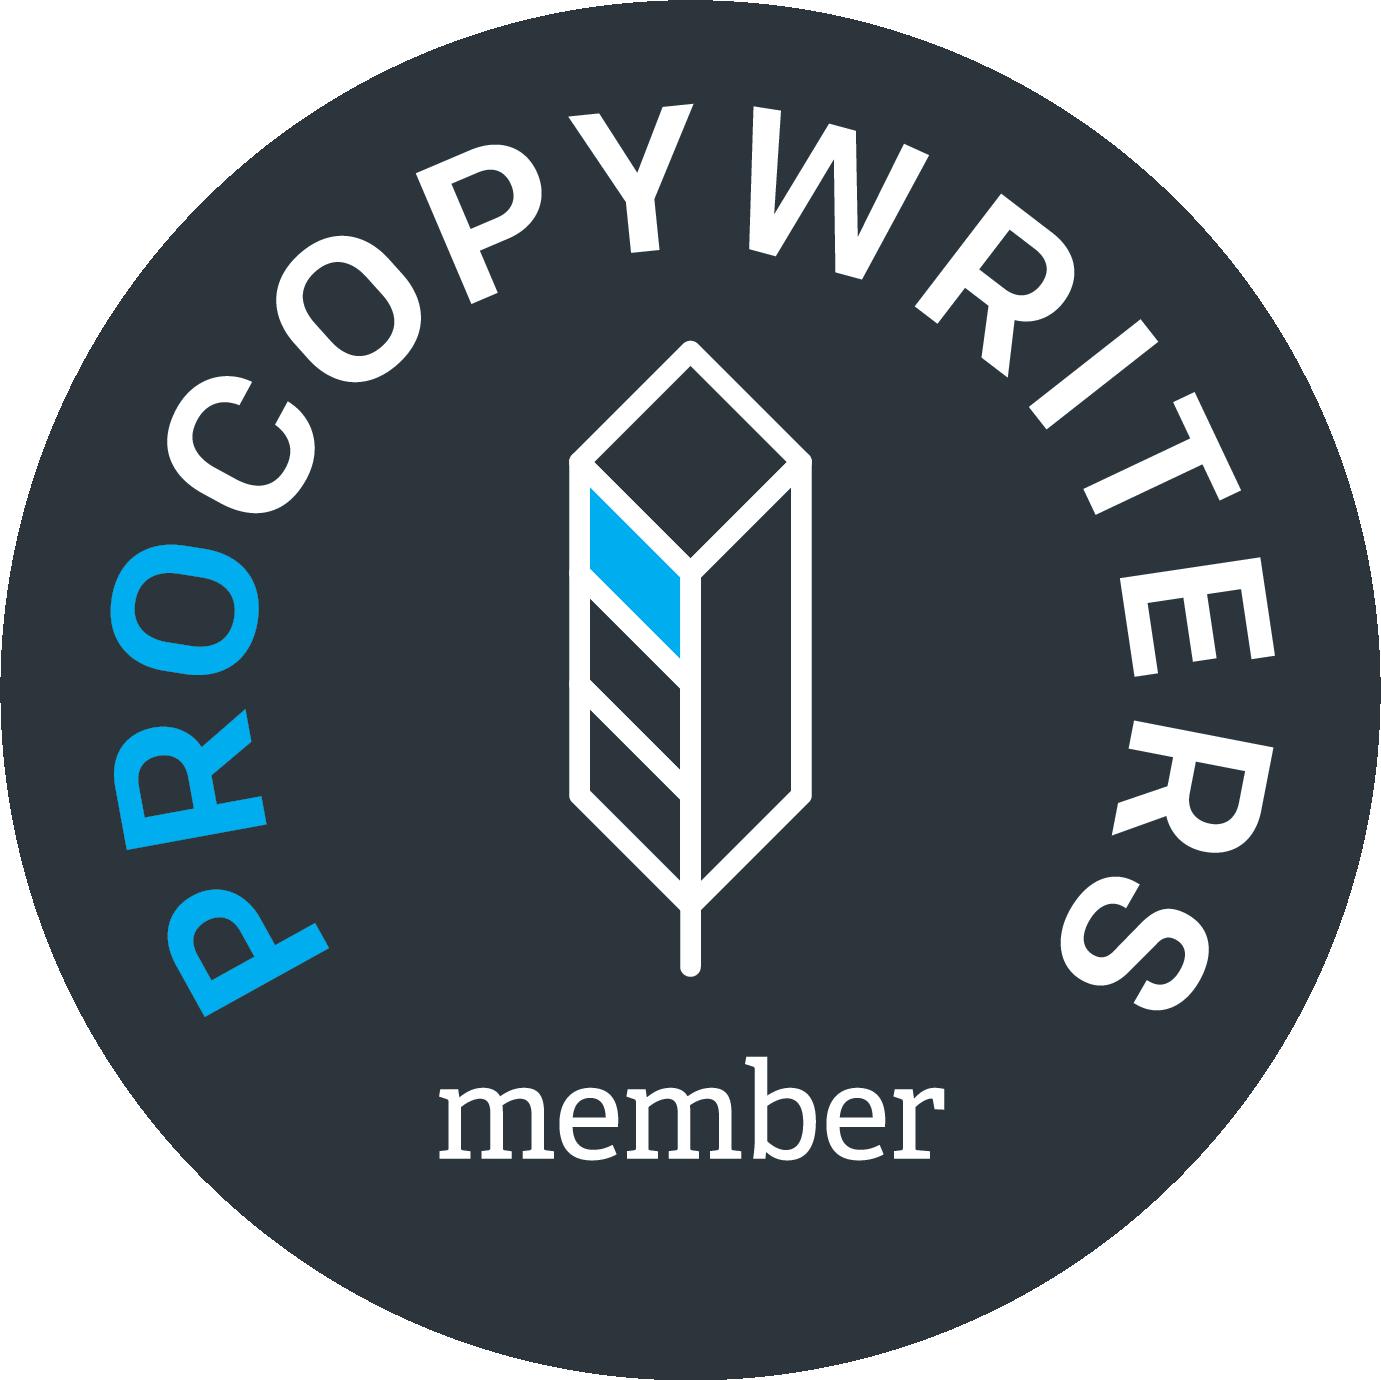 procopywriters_logo_member_dark.png